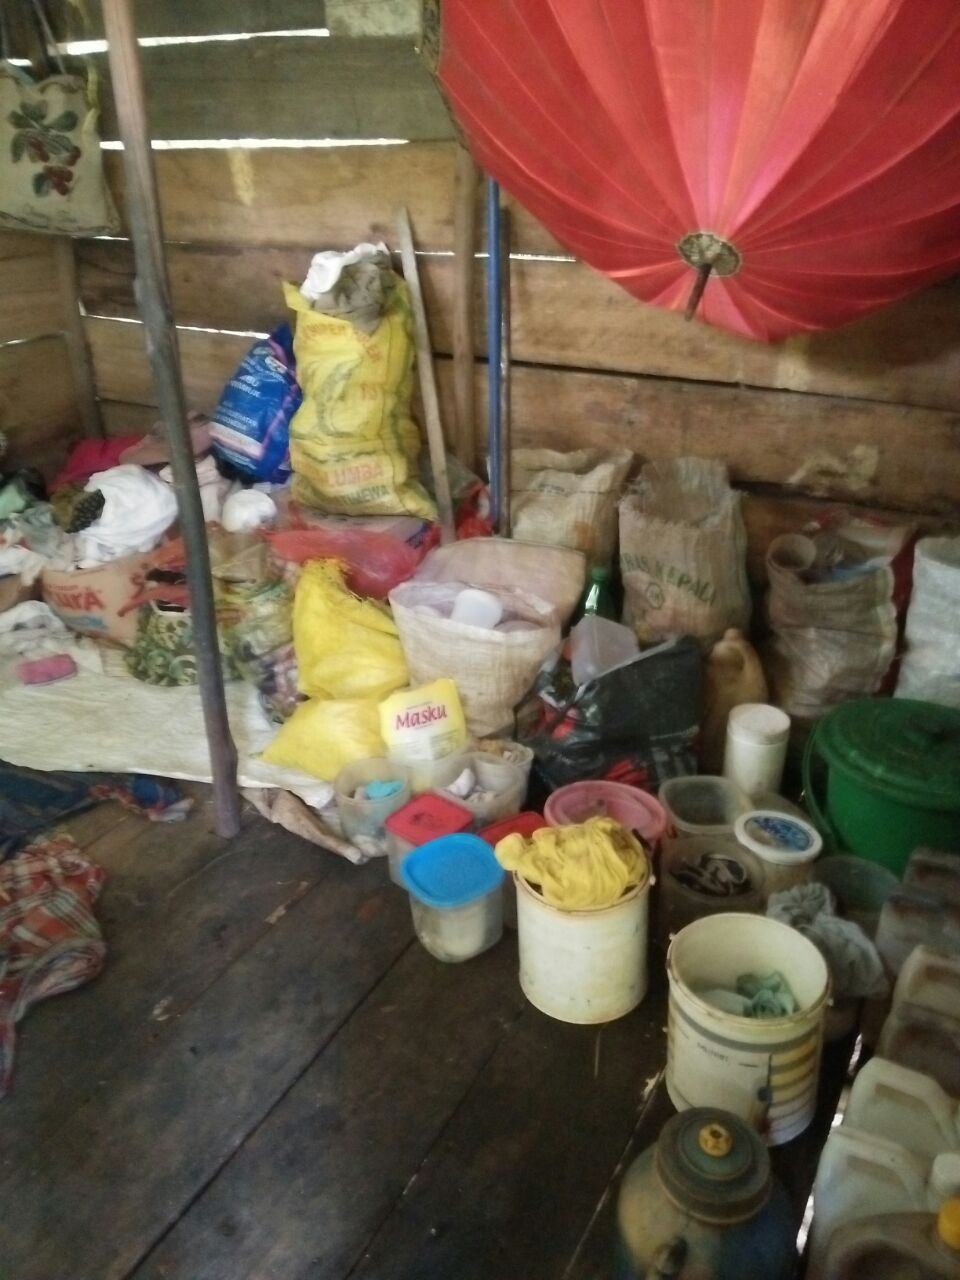 barang-barang milik ibu Kartini yang bertumpukan disatu ruangan